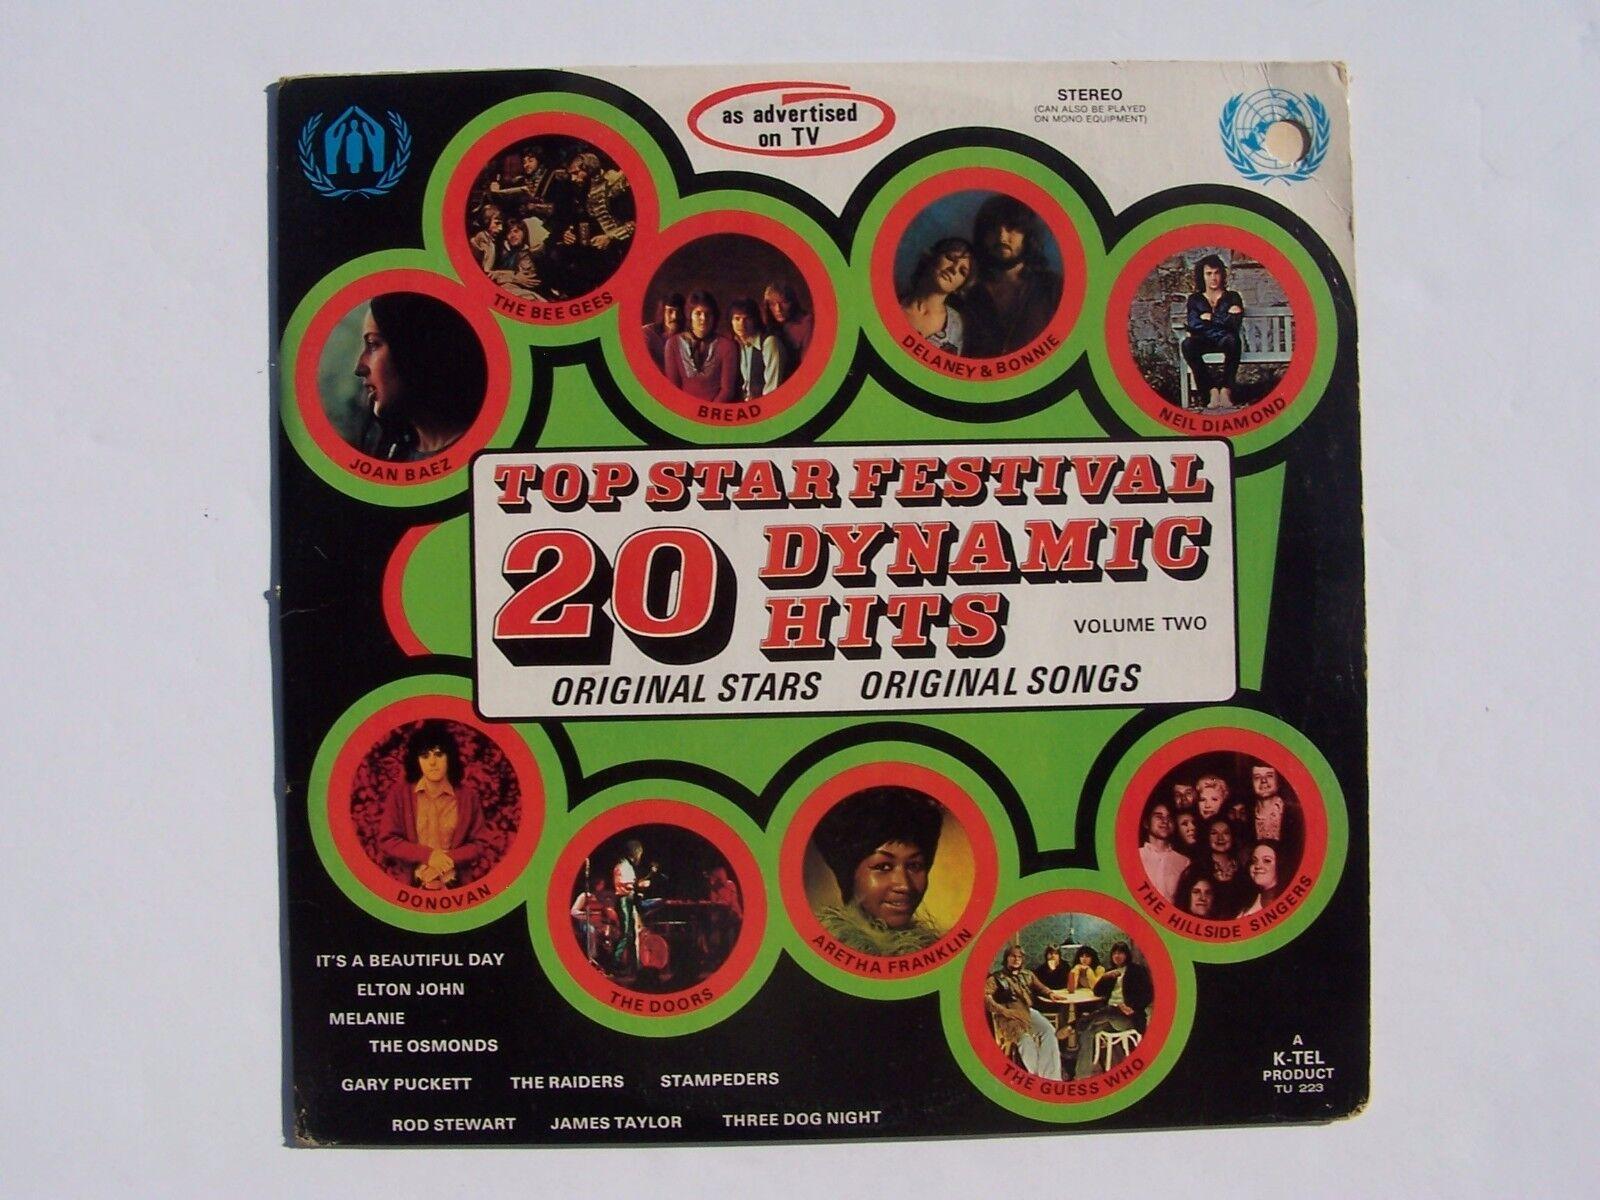 20 Top Star Festival Dynamic Hits Volume Two Vinyl LP R